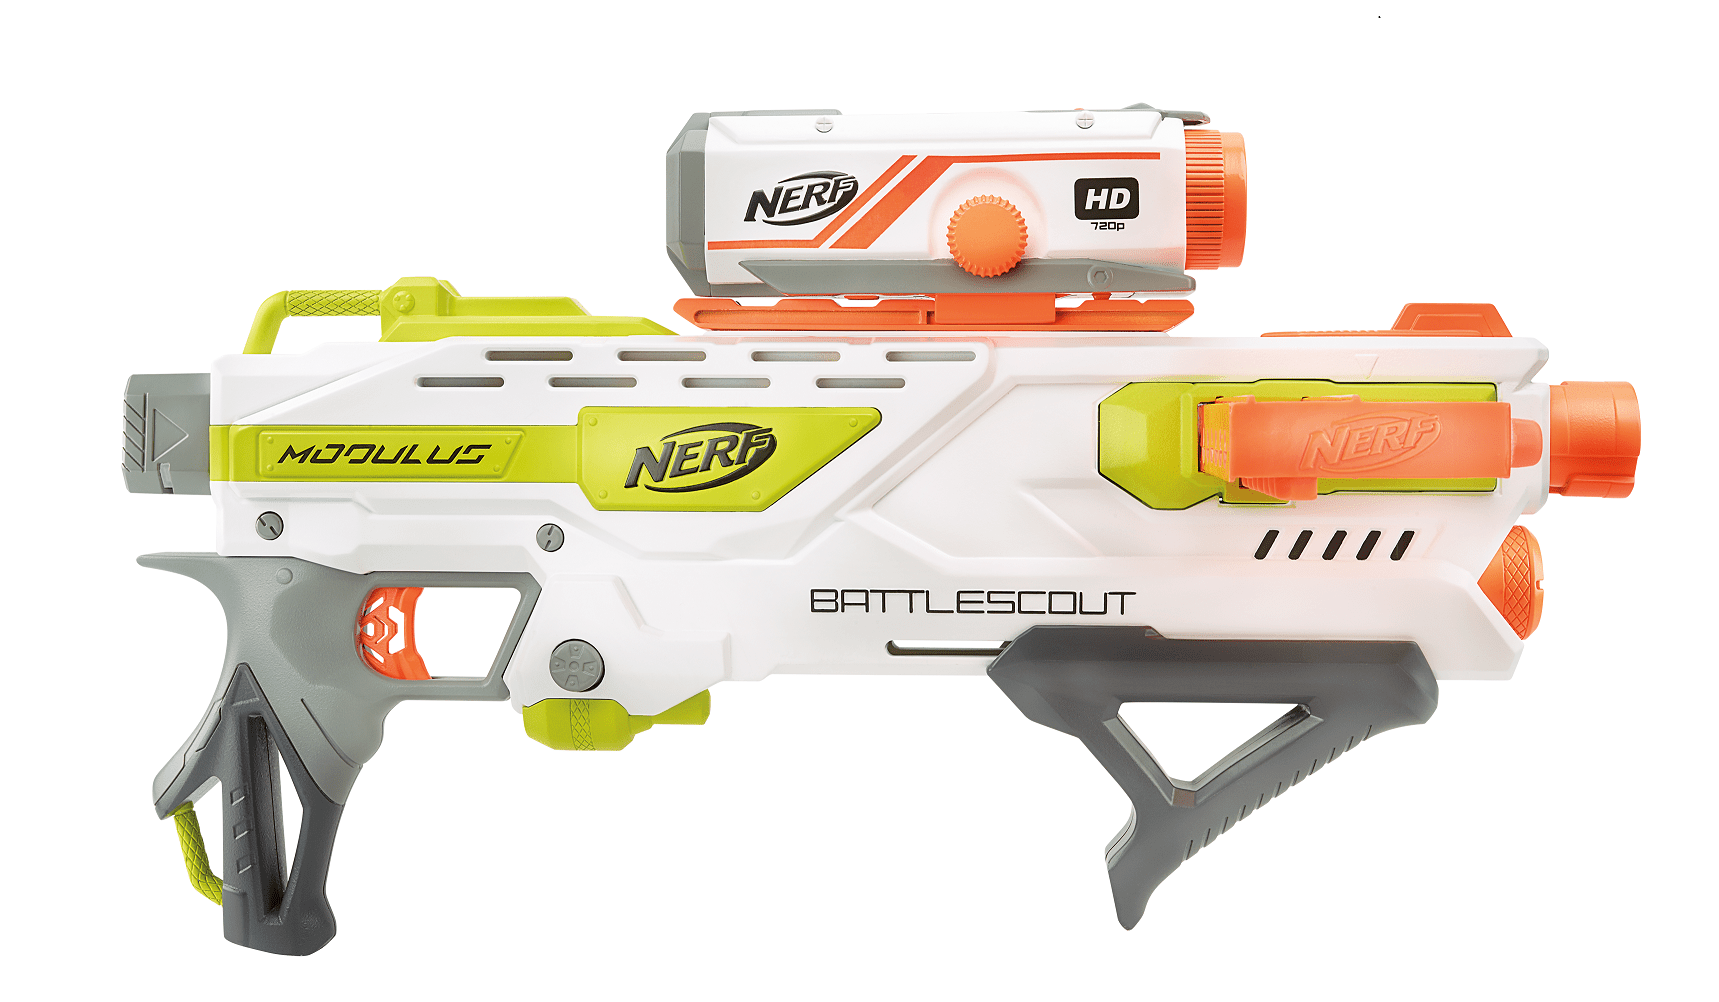 Introducing The Nerf N Strike Modulus Battlescout Ics 10